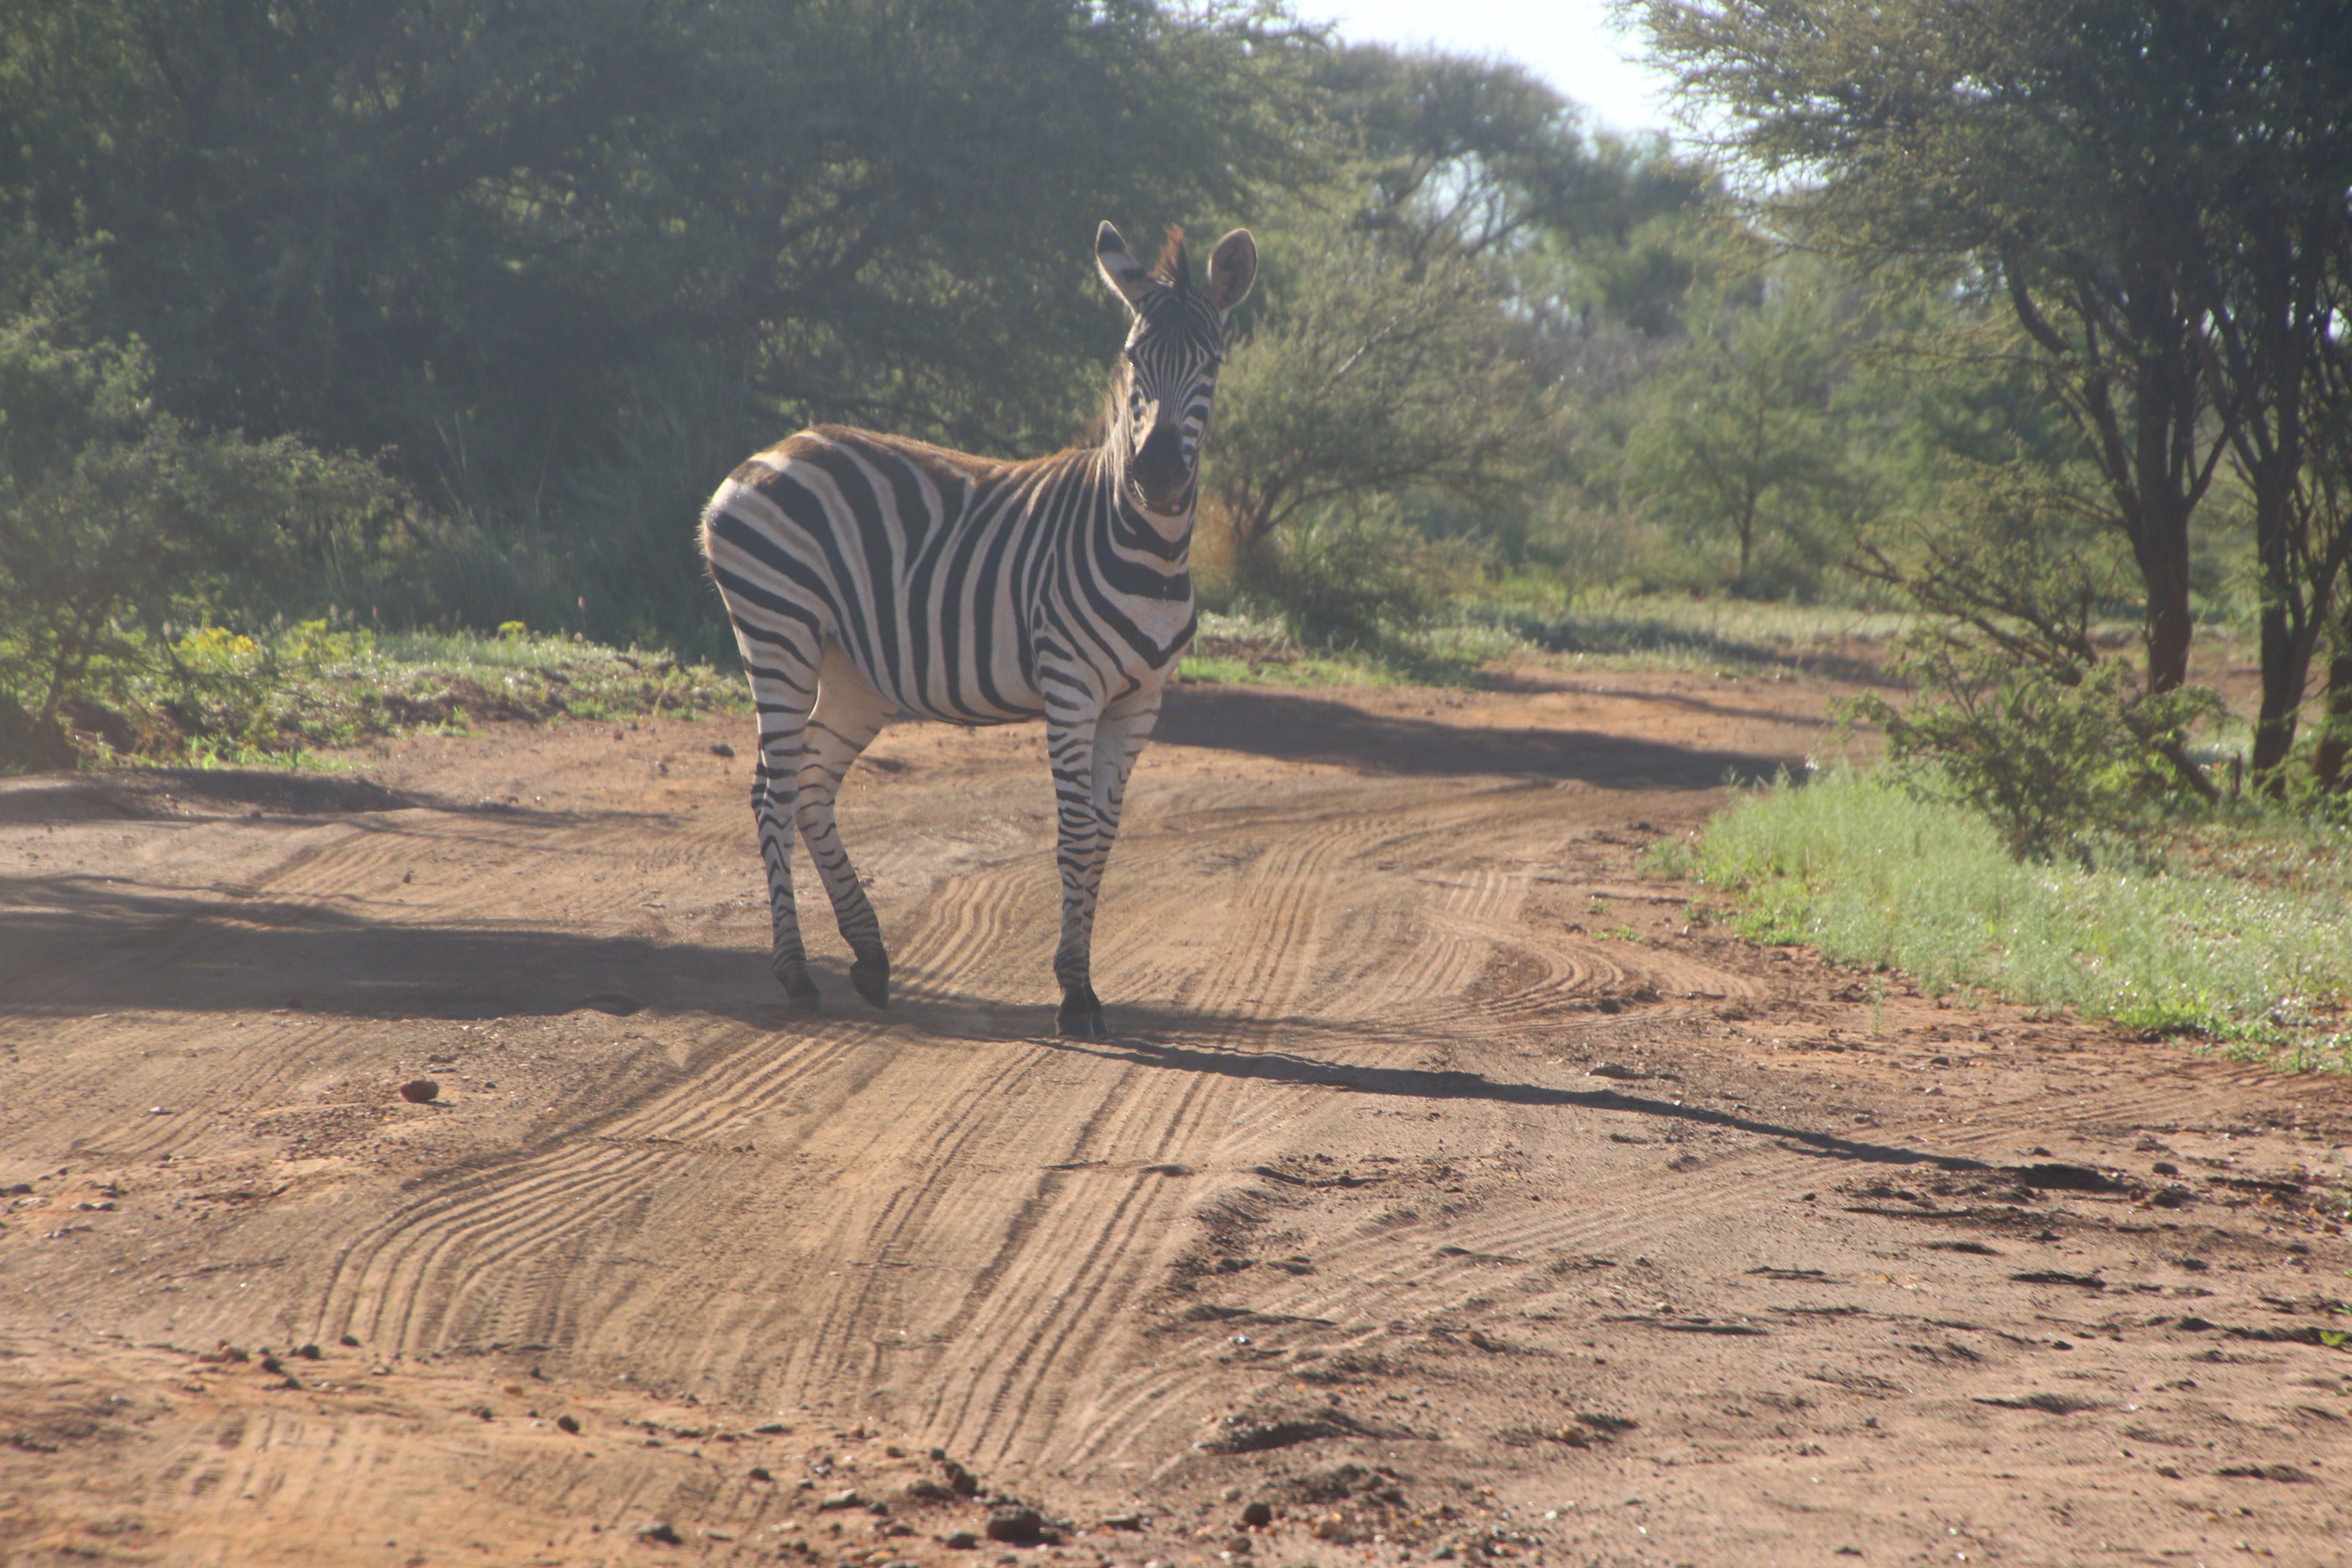 Photo of Zebra on Dirt Road